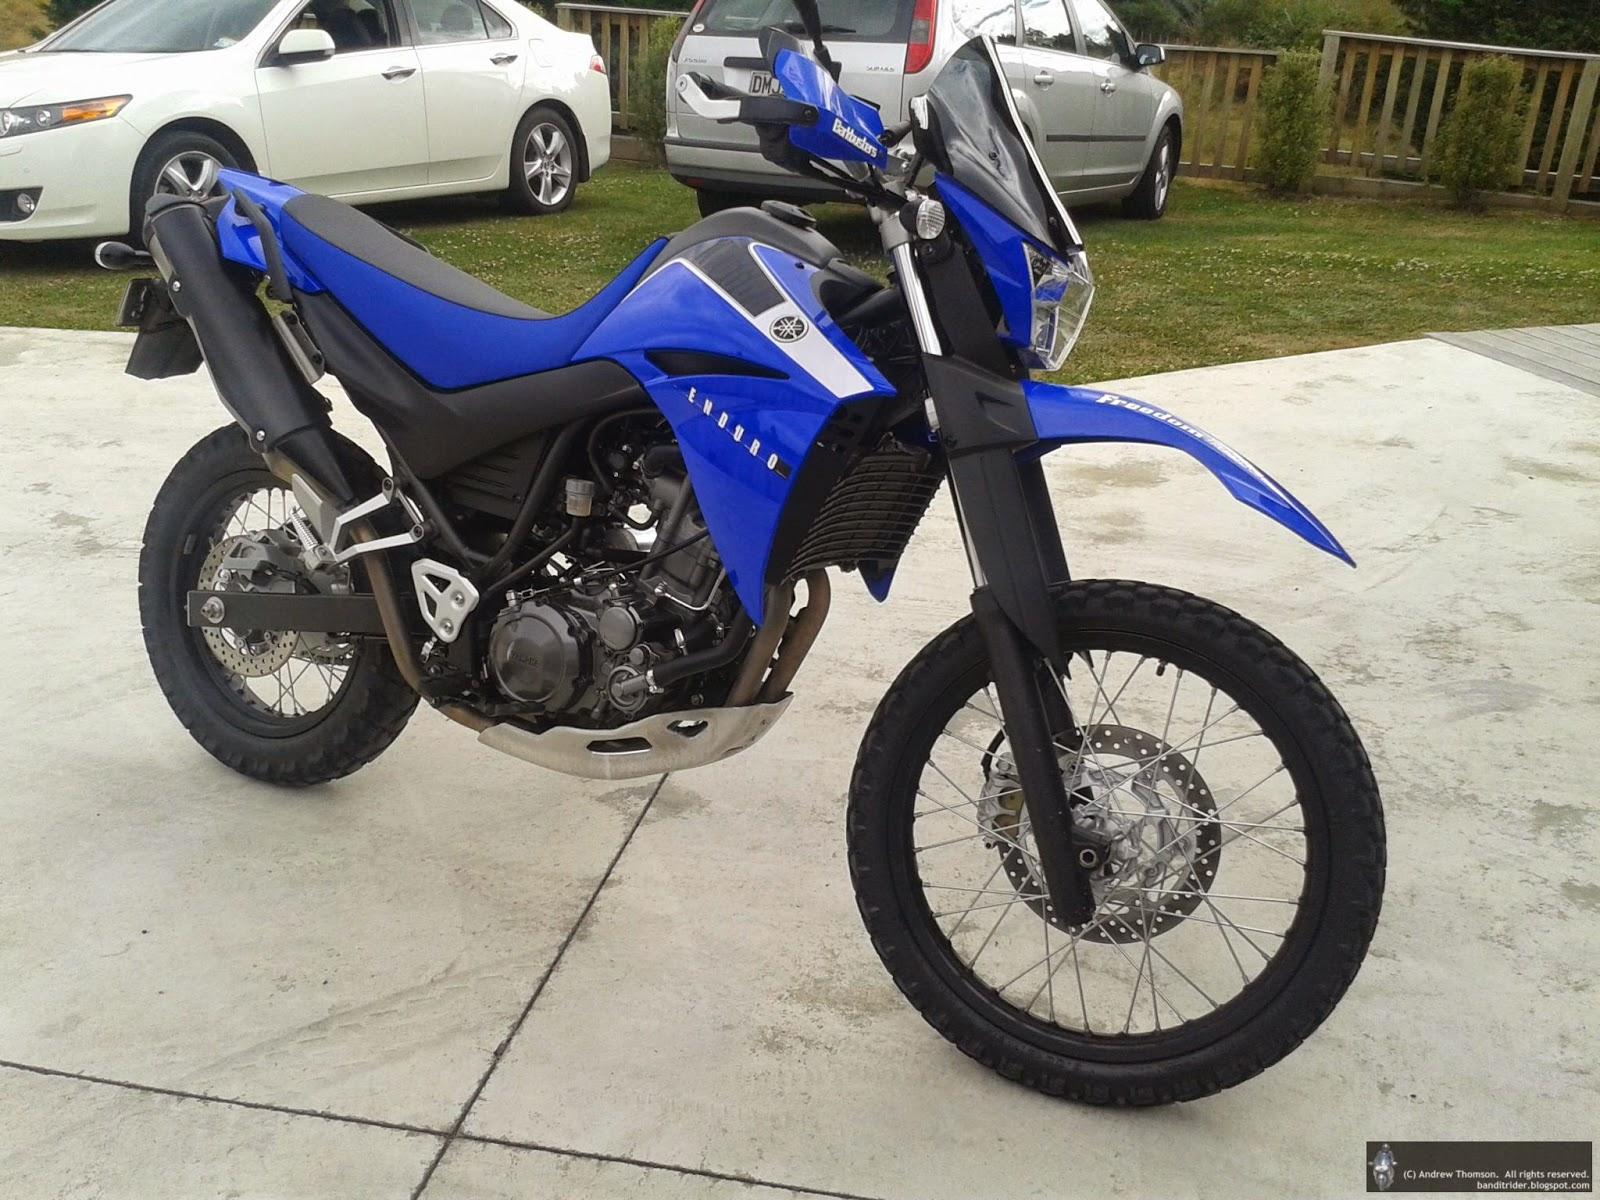 Bandit Rider Xt660r